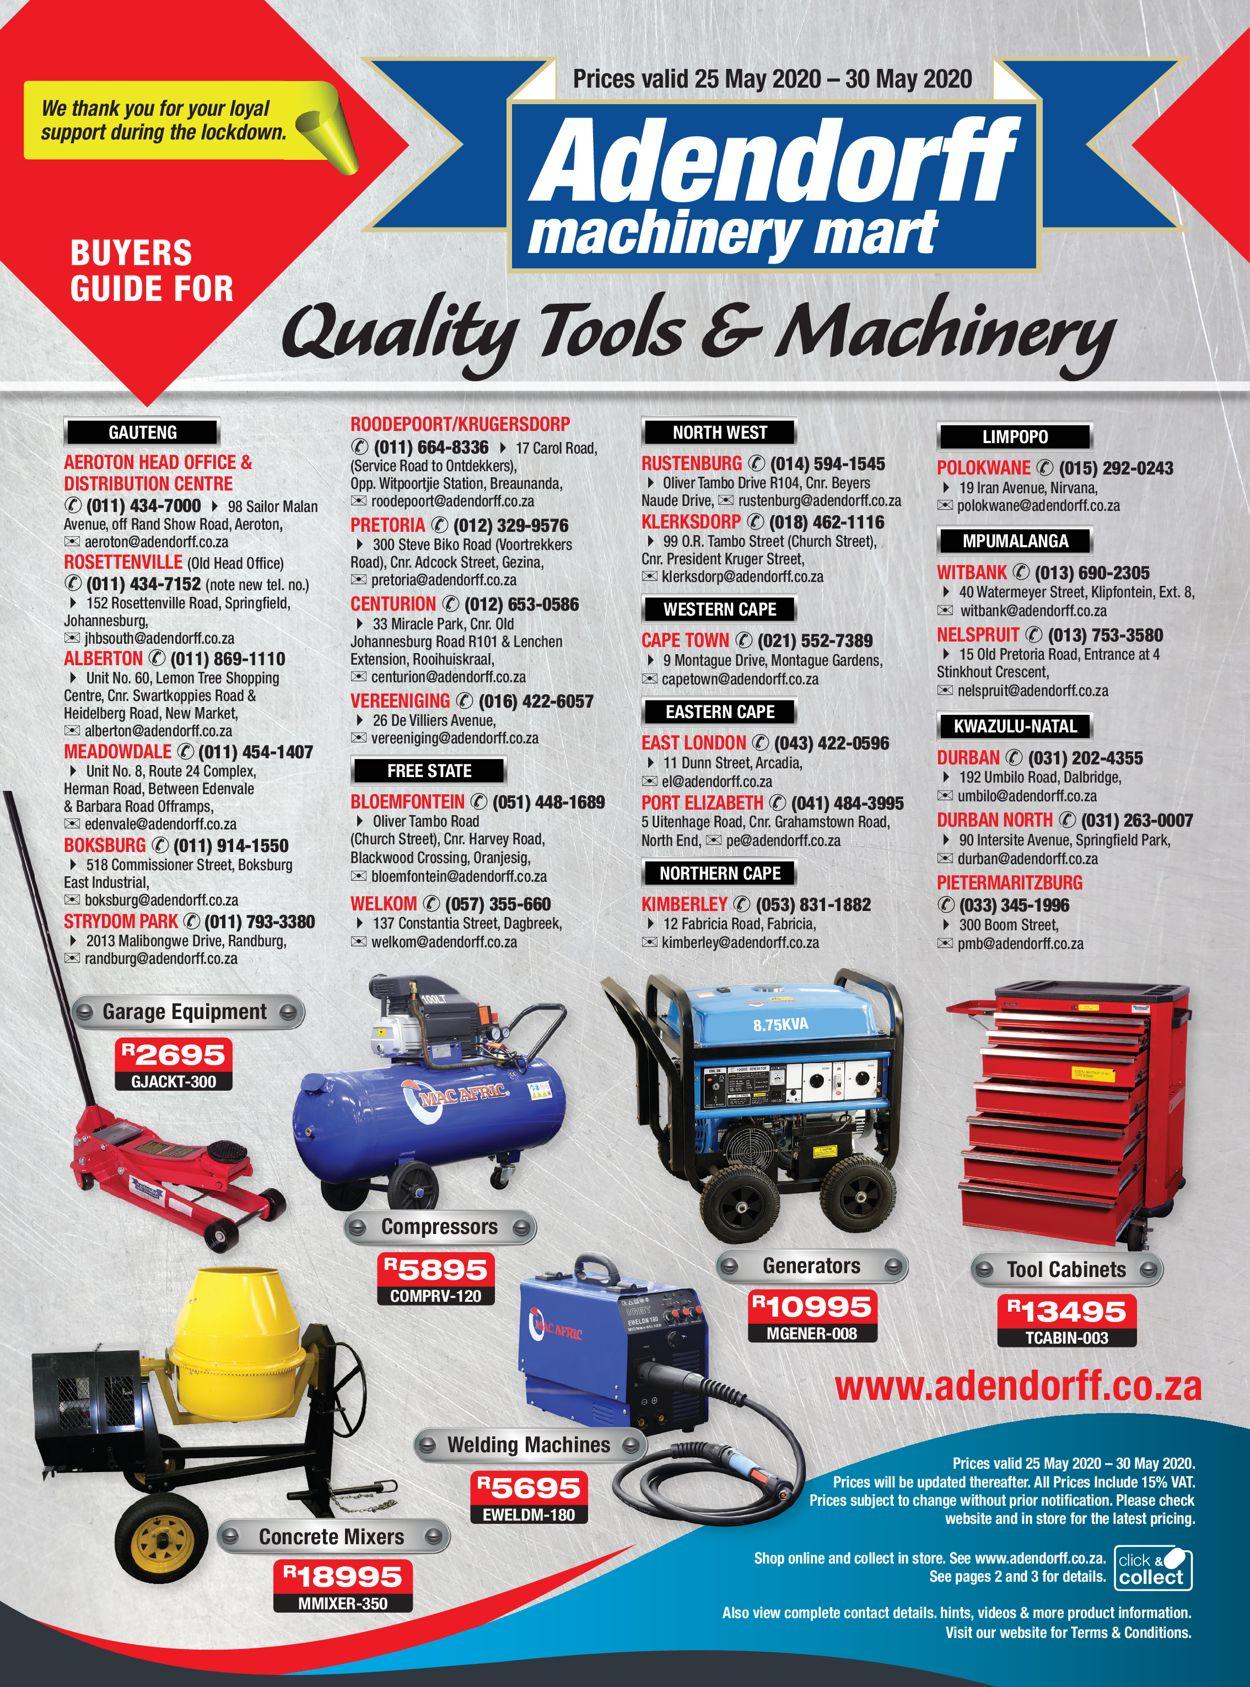 Adendorff Machinery Mart Catalogue - 2020/05/25-2020/05/30